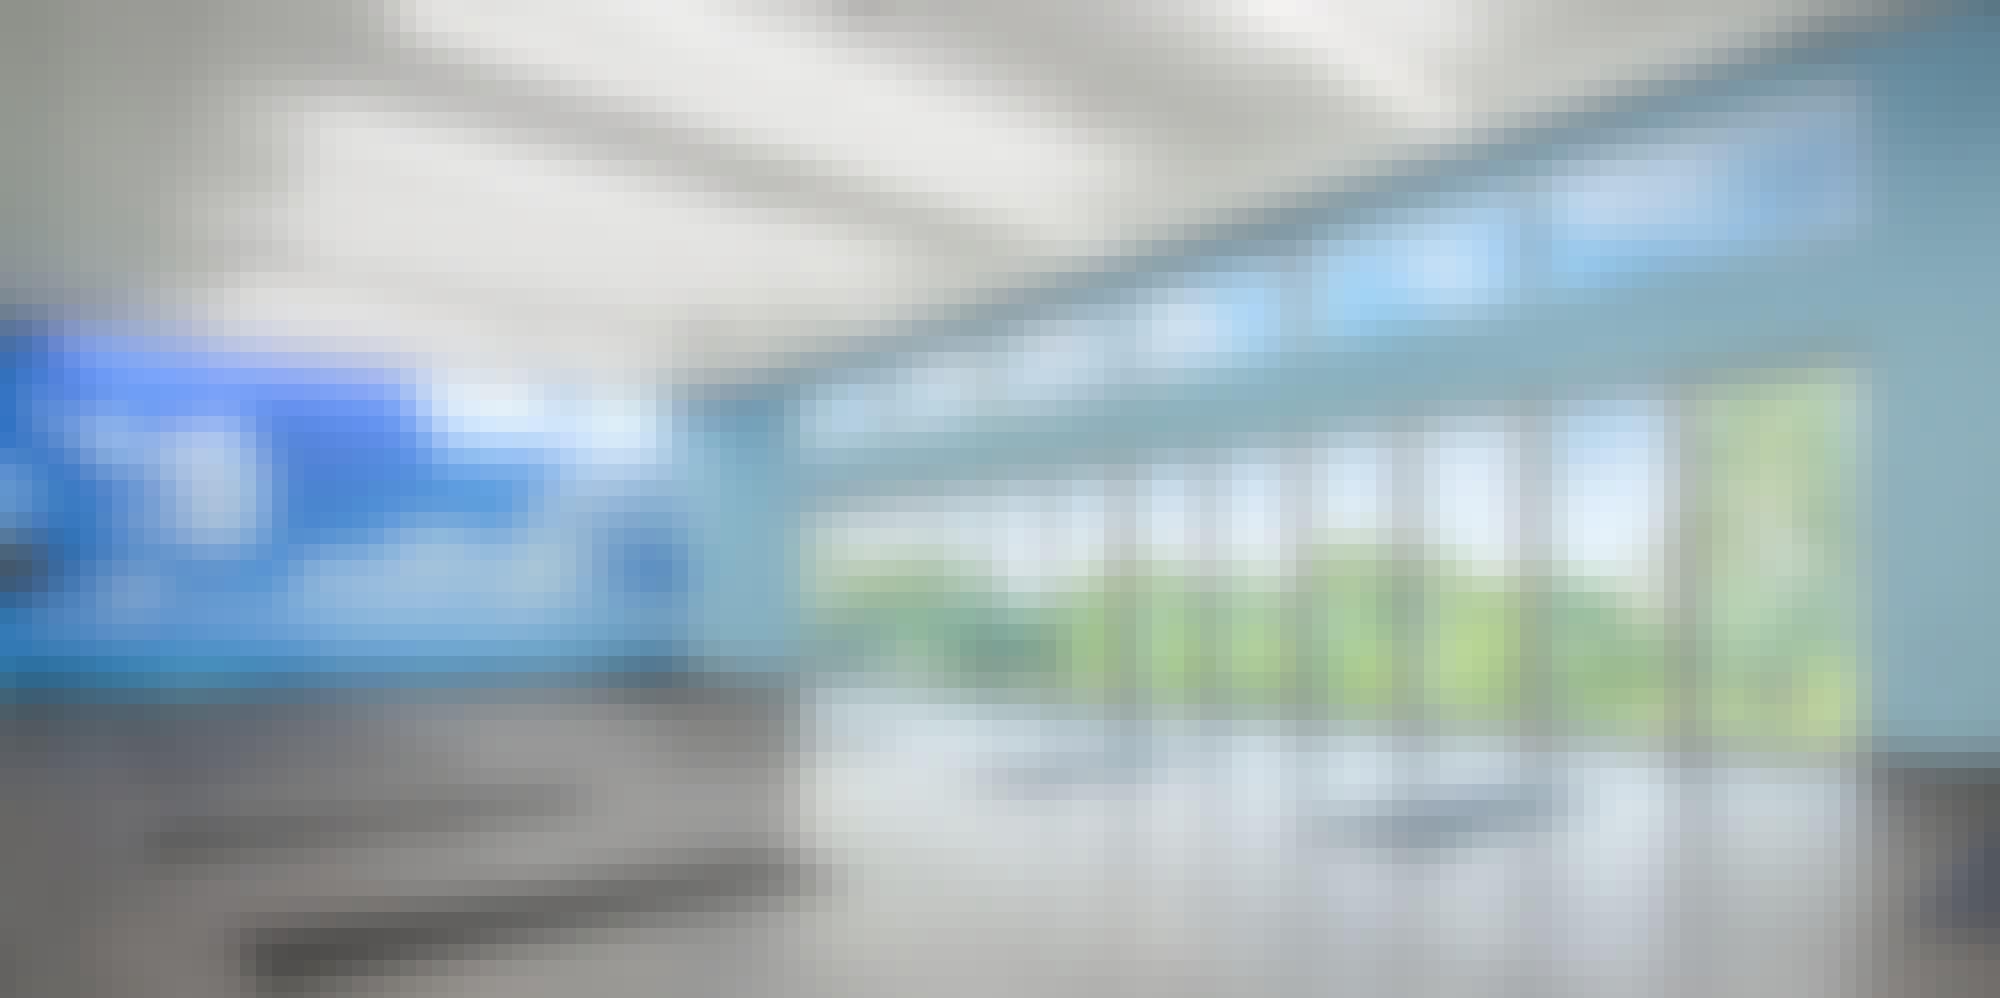 Movati athetlectic facility yoga room with closed folding glass wall